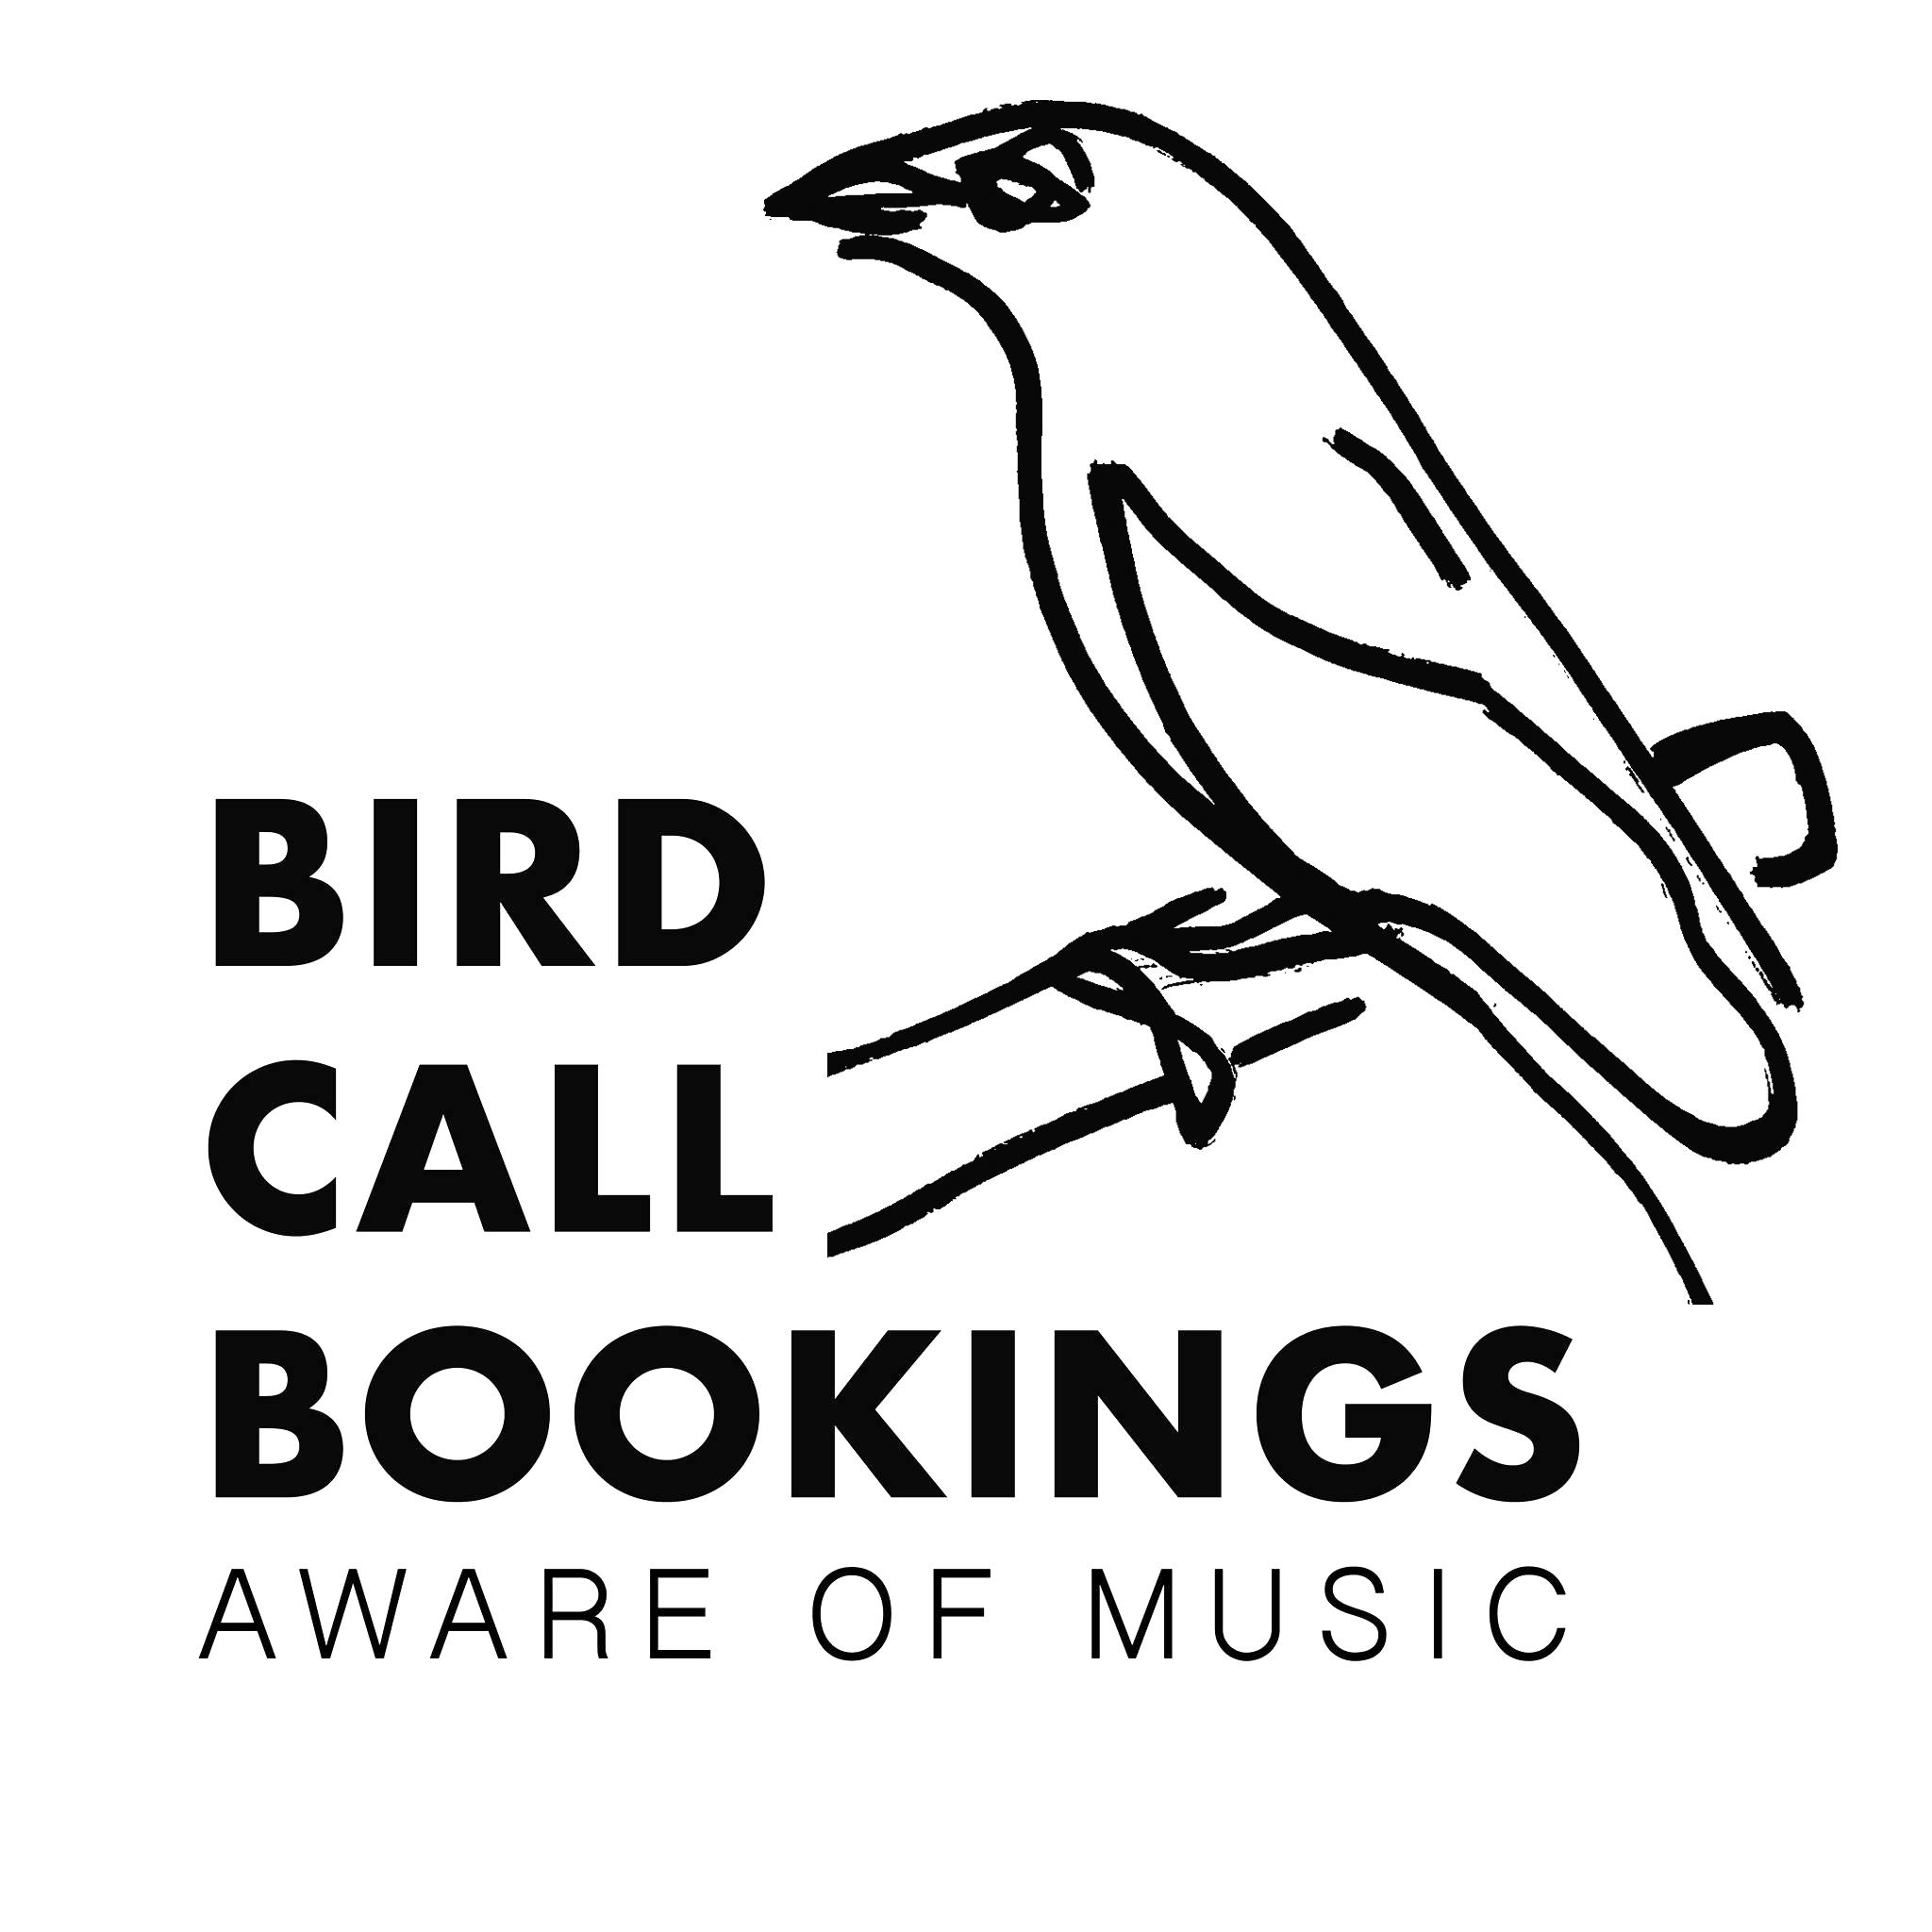 Bird Call Bookings